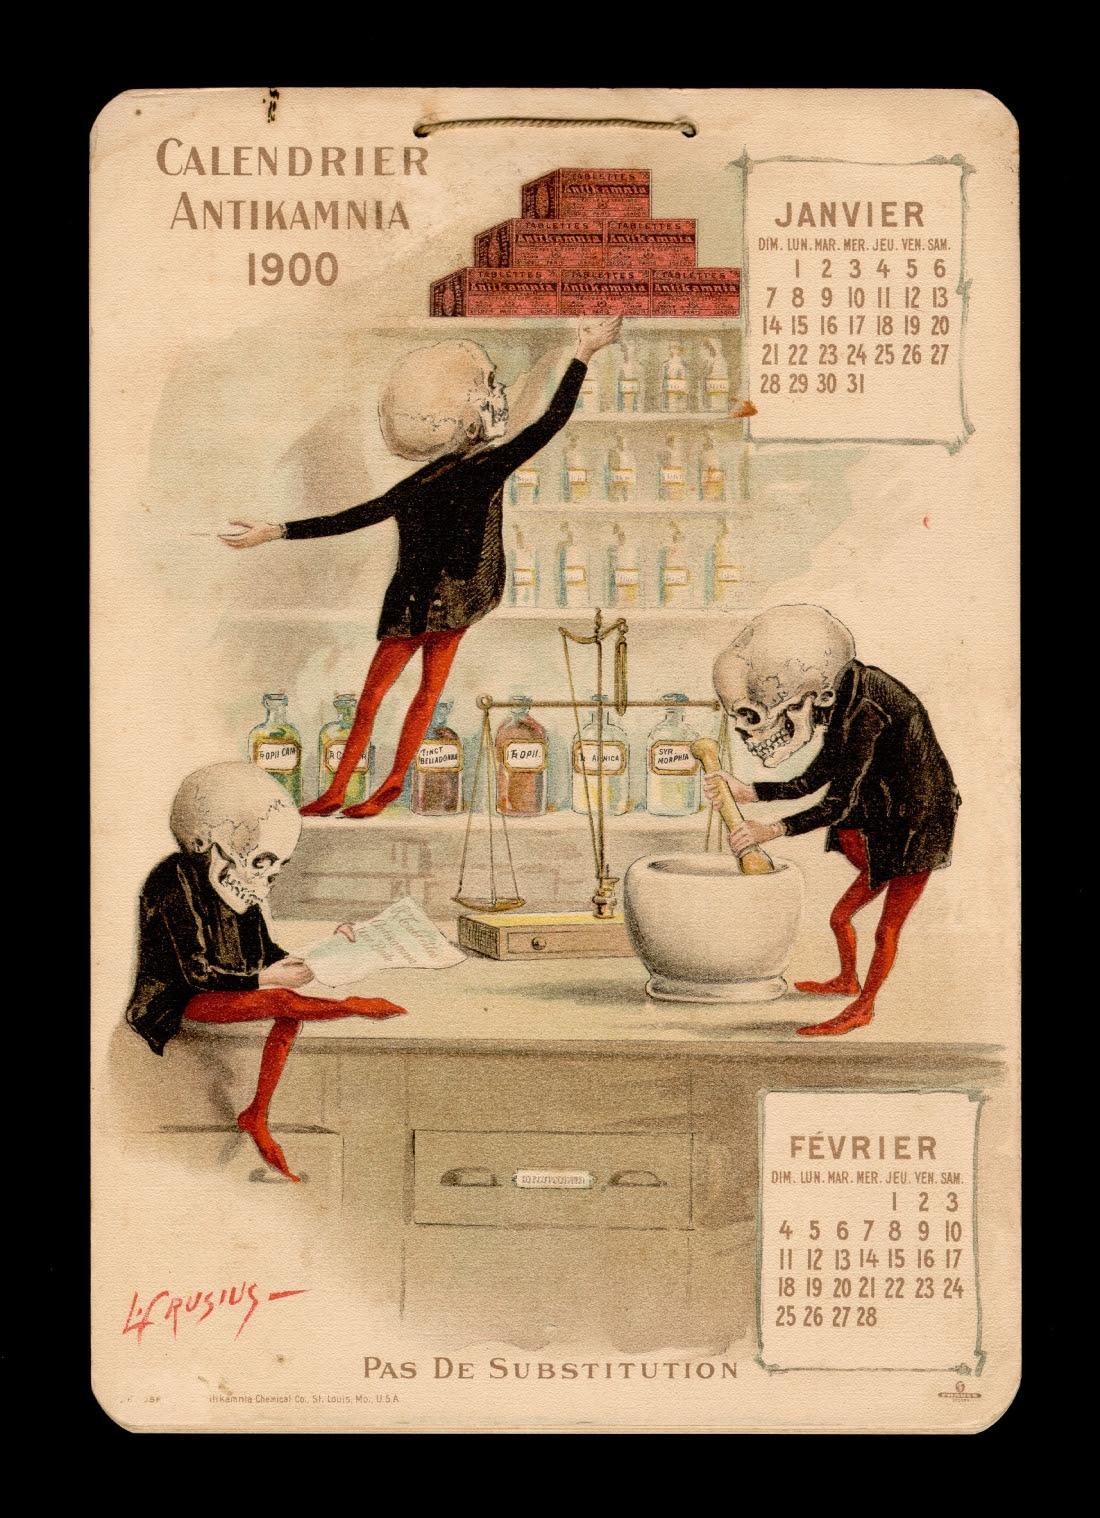 Antikamnia calendar 1900 - french